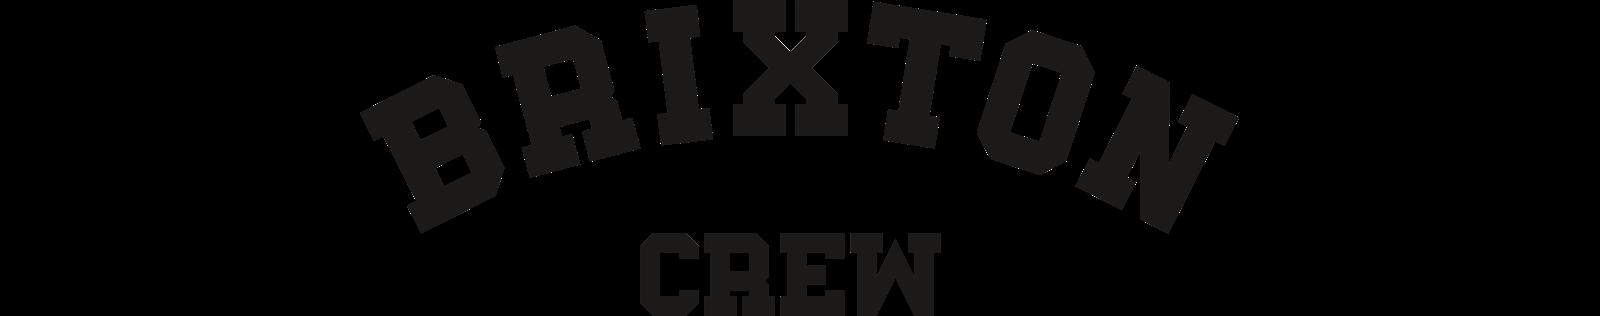 Brixton crew logo